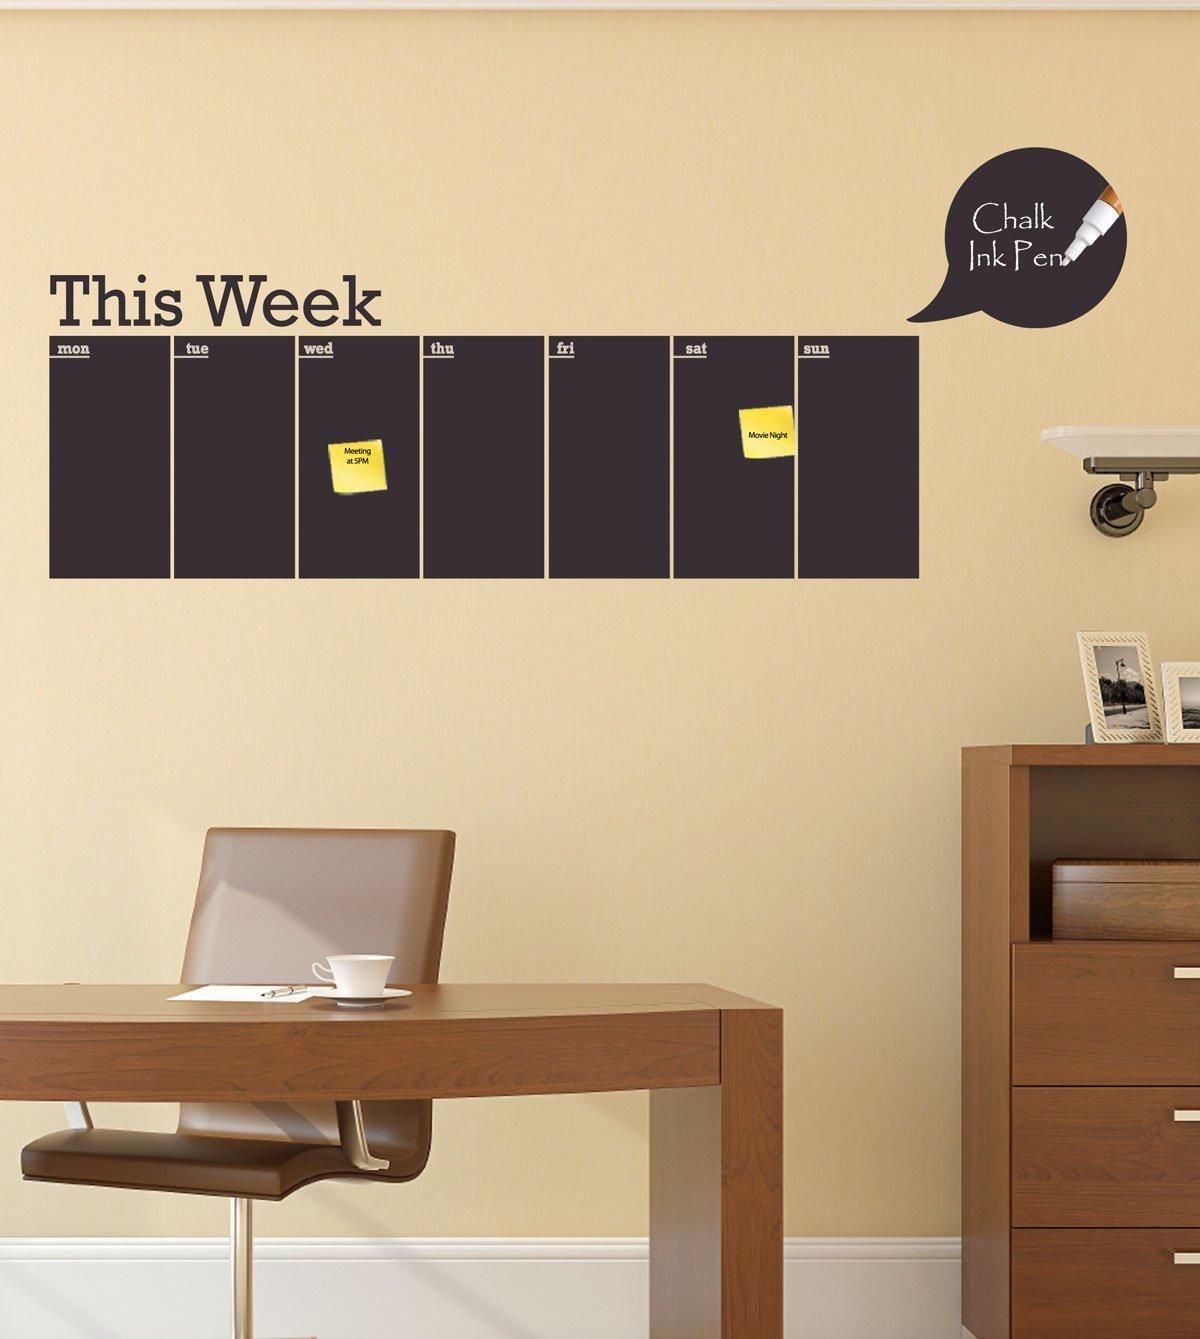 Amazon.com: Weekly Chalkboard Calendar - This Week Horizontal ...